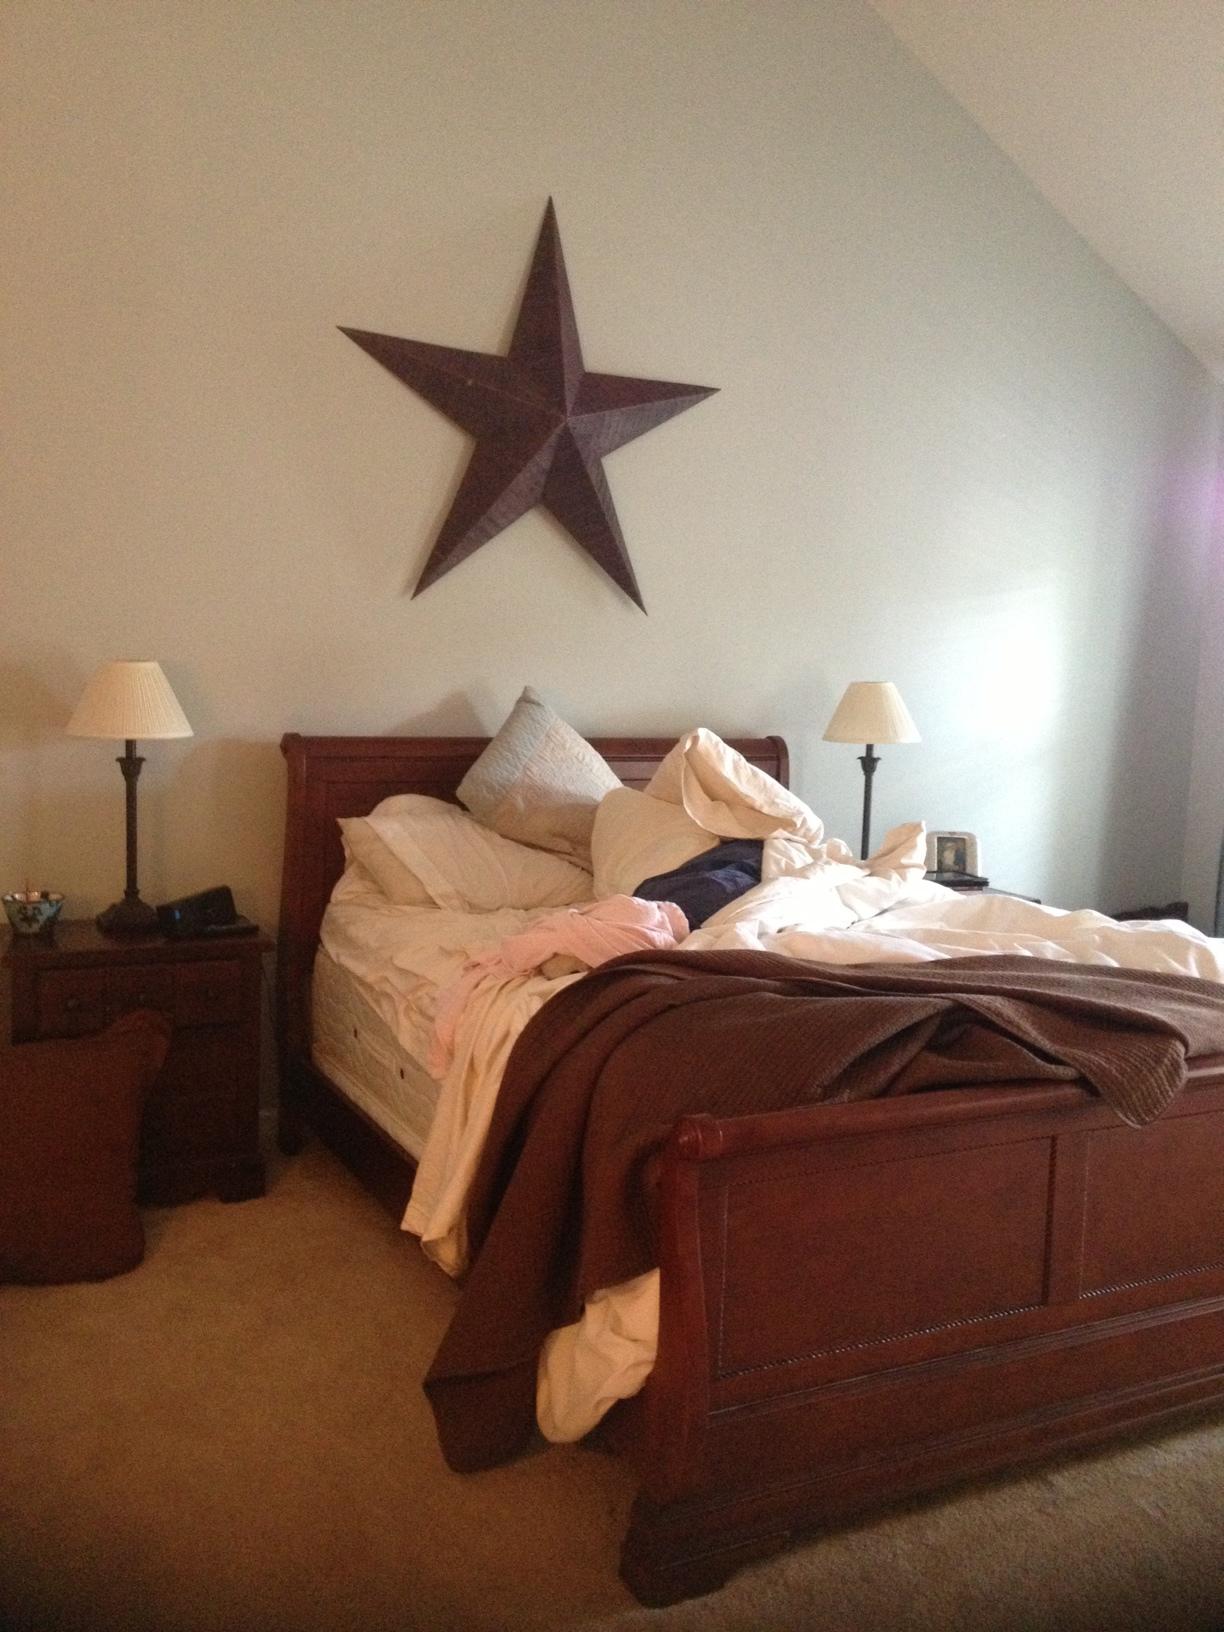 Bedroom : BEFORE